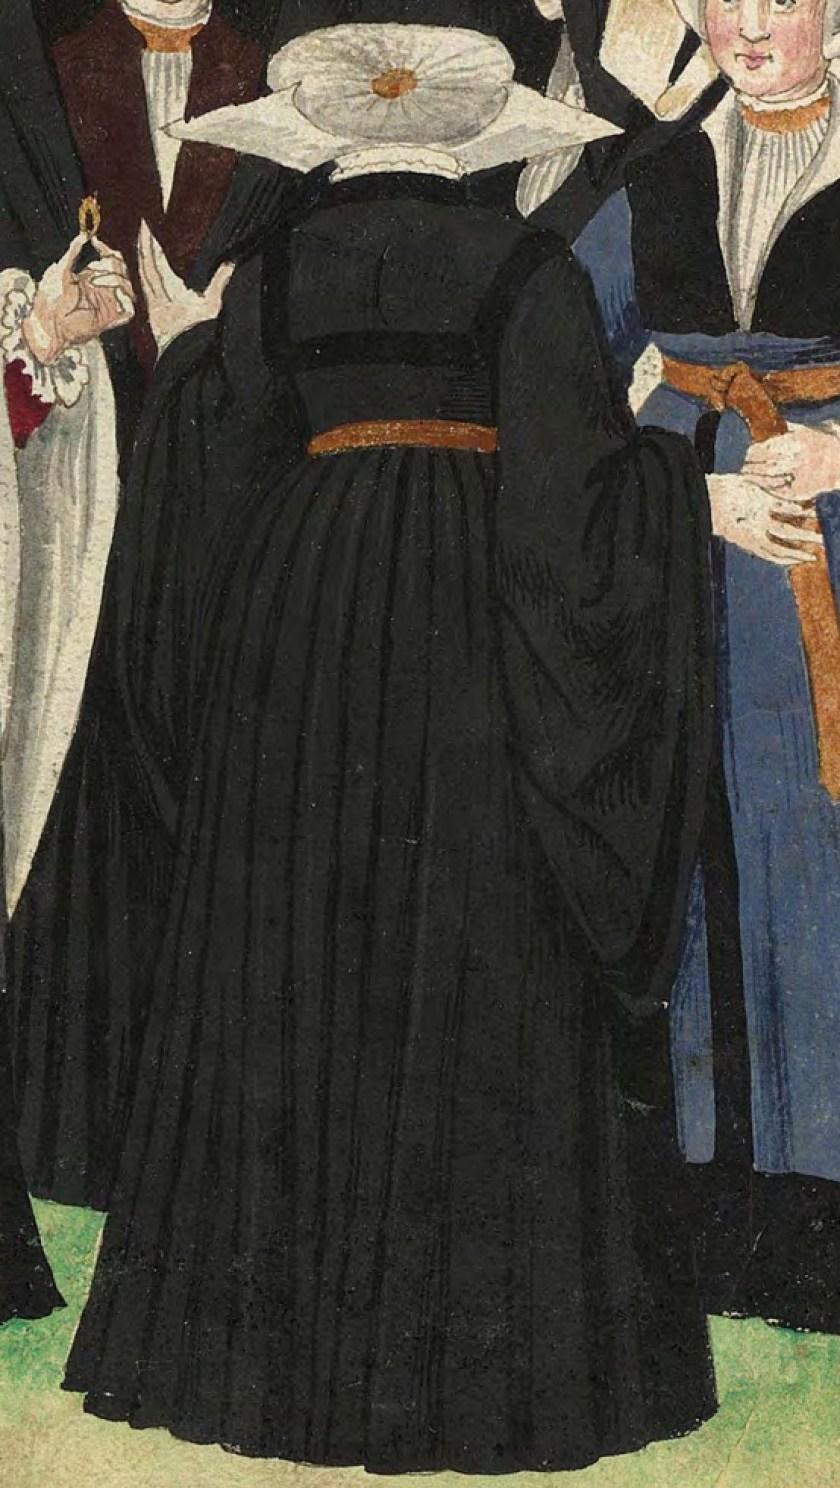 1540s Cologne Burger. Fig. 3, plate 45r, Codice de trajes, Christoph Weiditz. BNE bdh0000052132